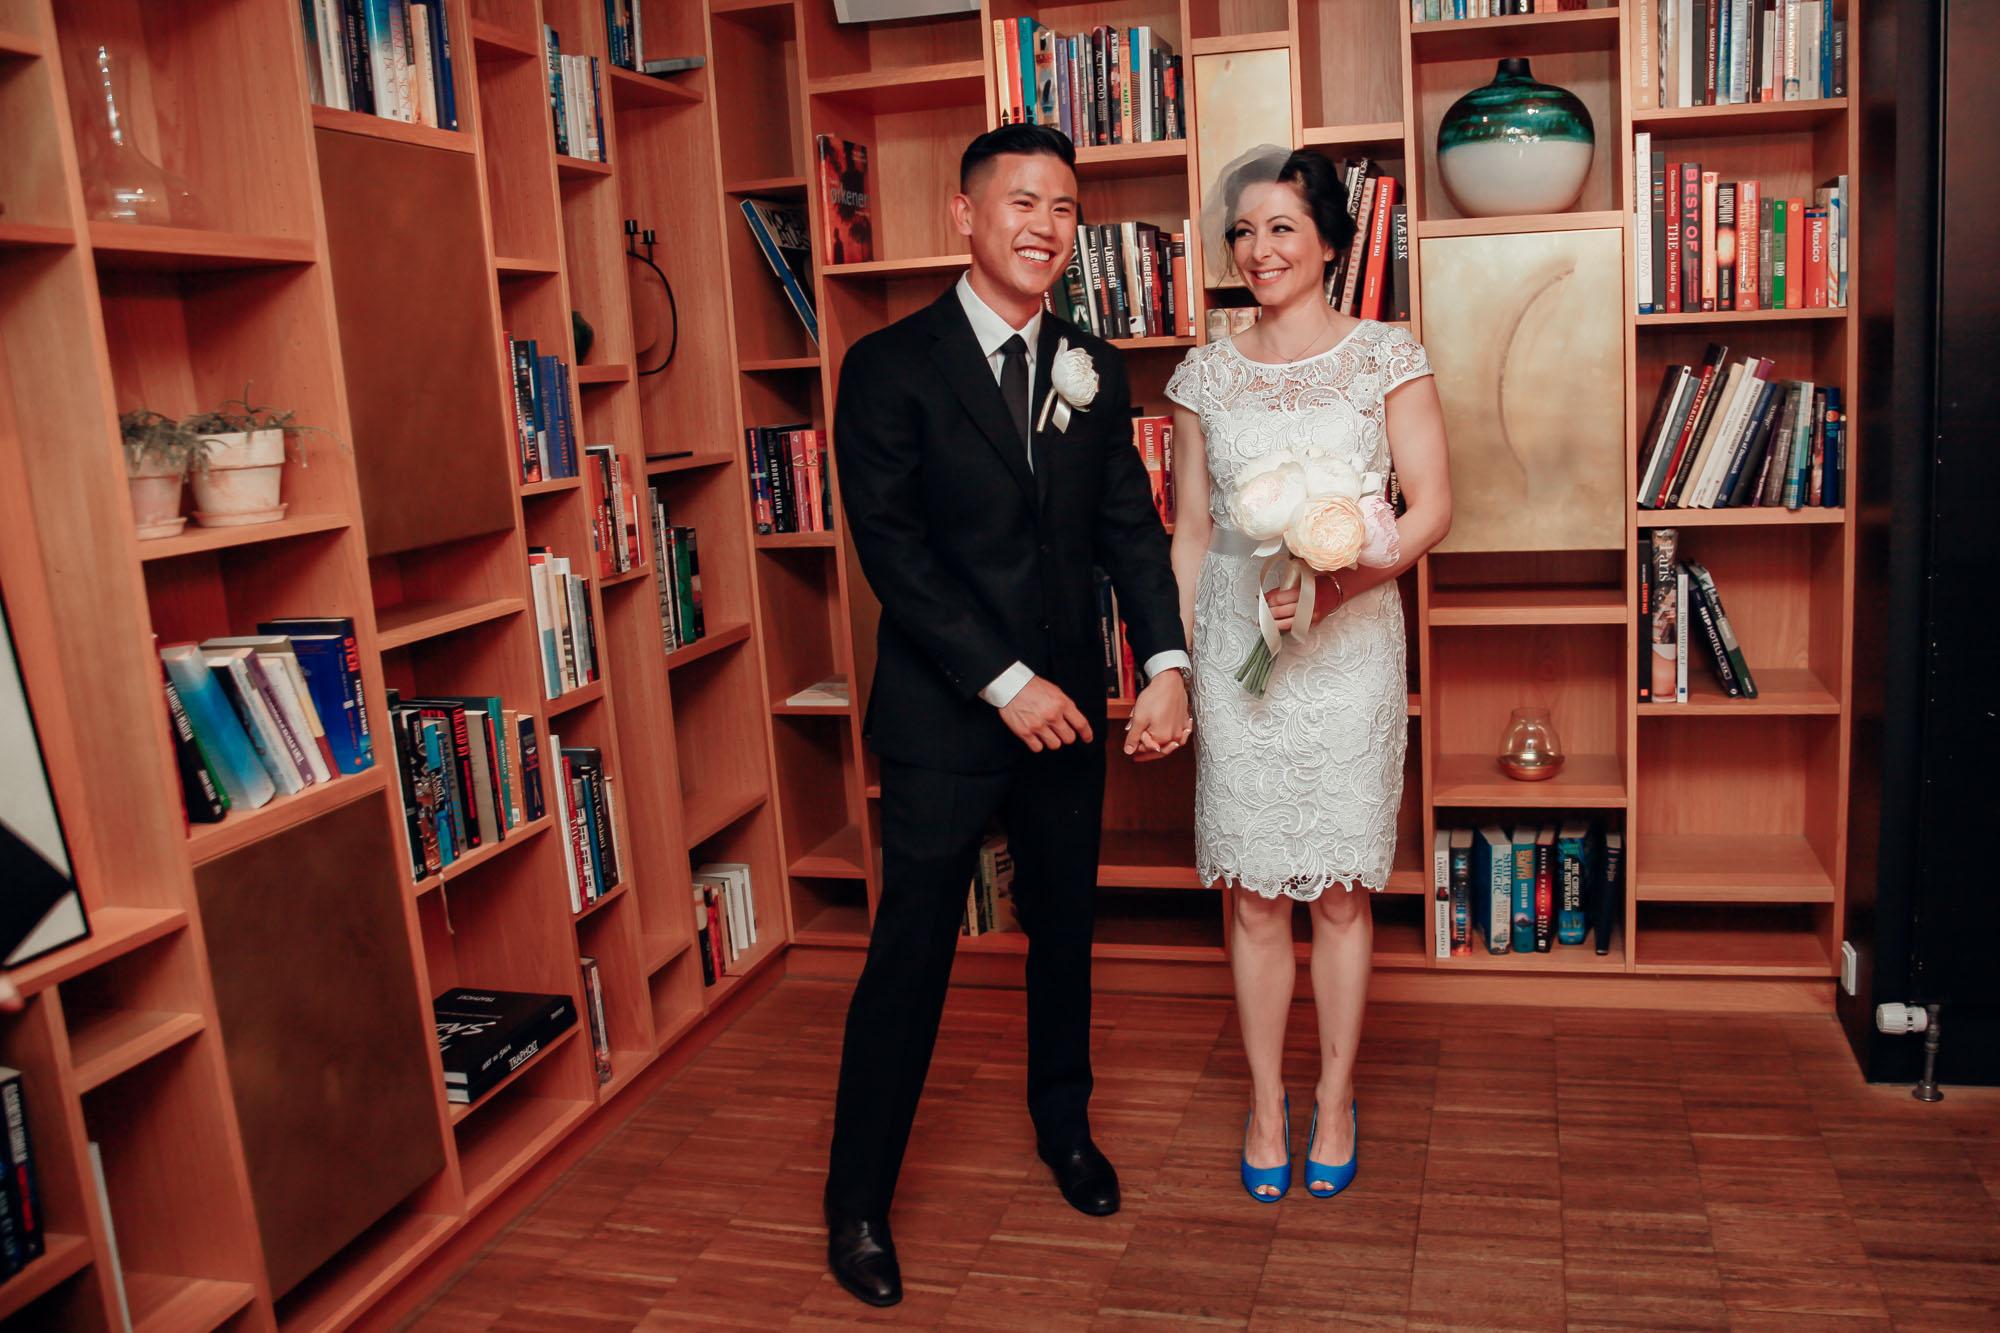 Copenhagen wedding photographer, City Hall wedding  (41 of 43)